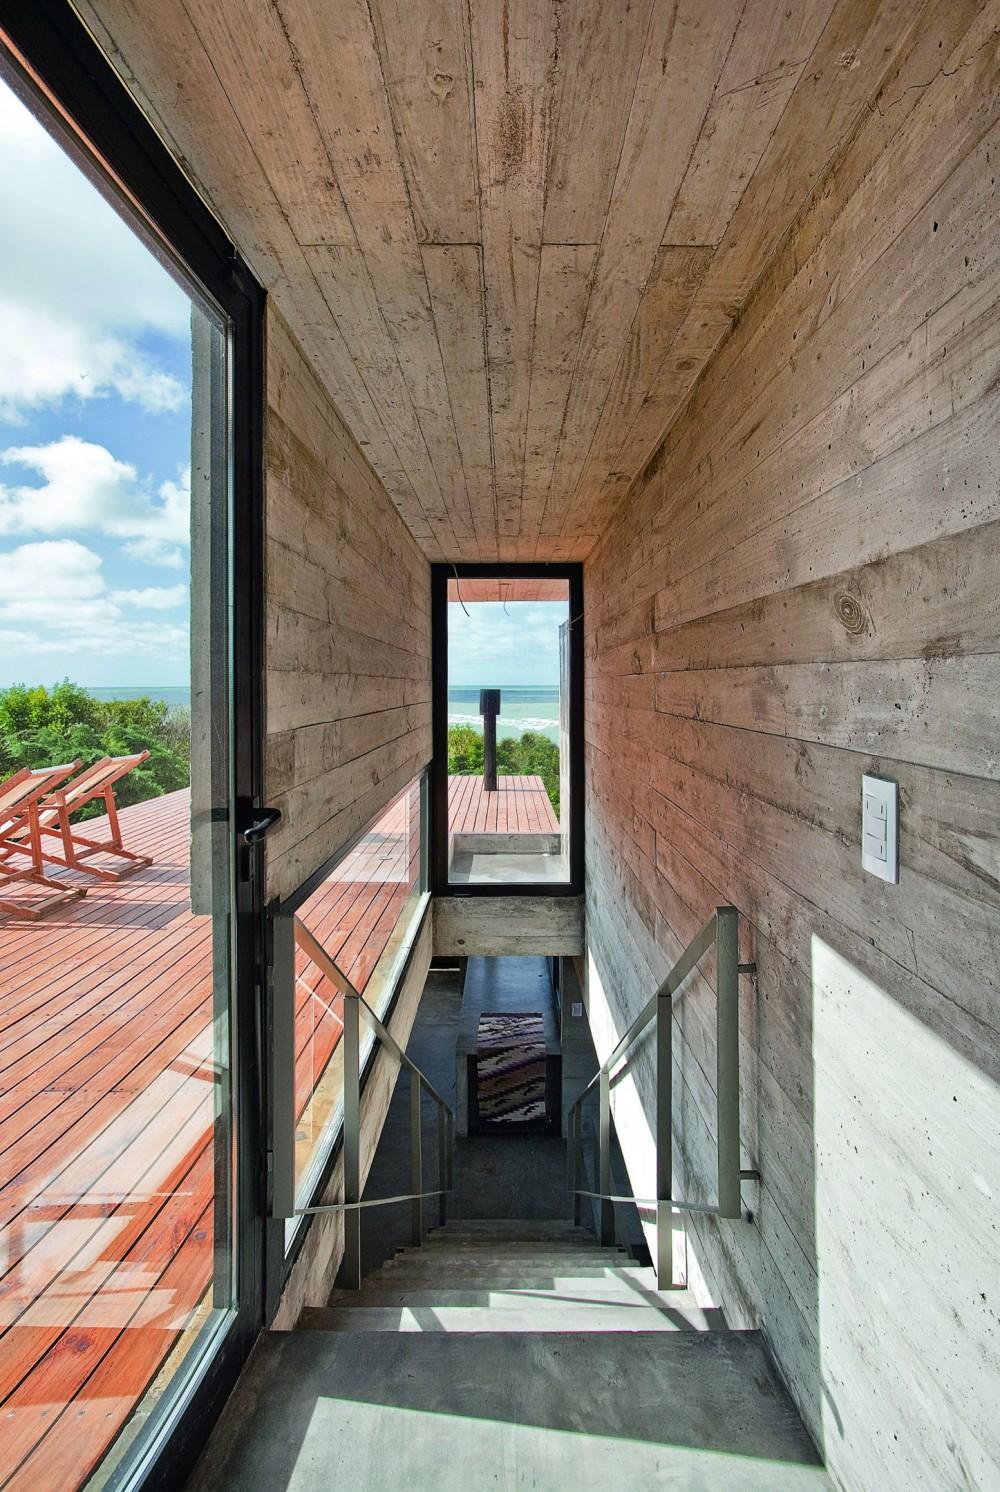 529d35d3e8e44e553d000042_casa-en-la-playa-bak-architects_00265447_r-1000x1492